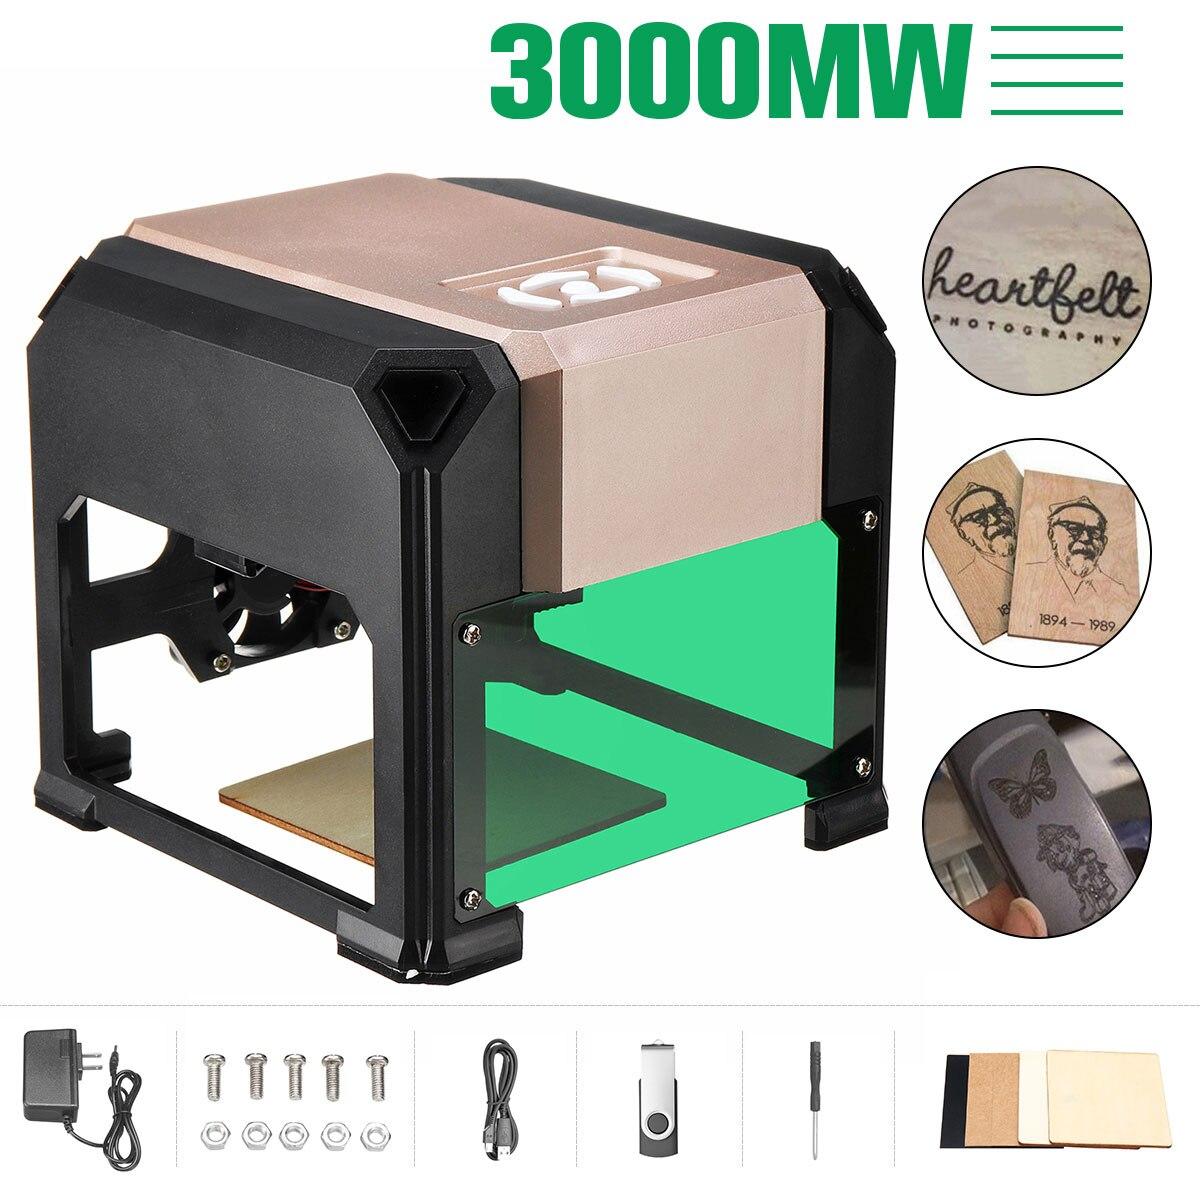 2000/3000mW USB bureau Laser graveur Machine logo bricolage marque imprimante Cutter CNC Laser sculpture Machine 80x80mm gamme de gravure